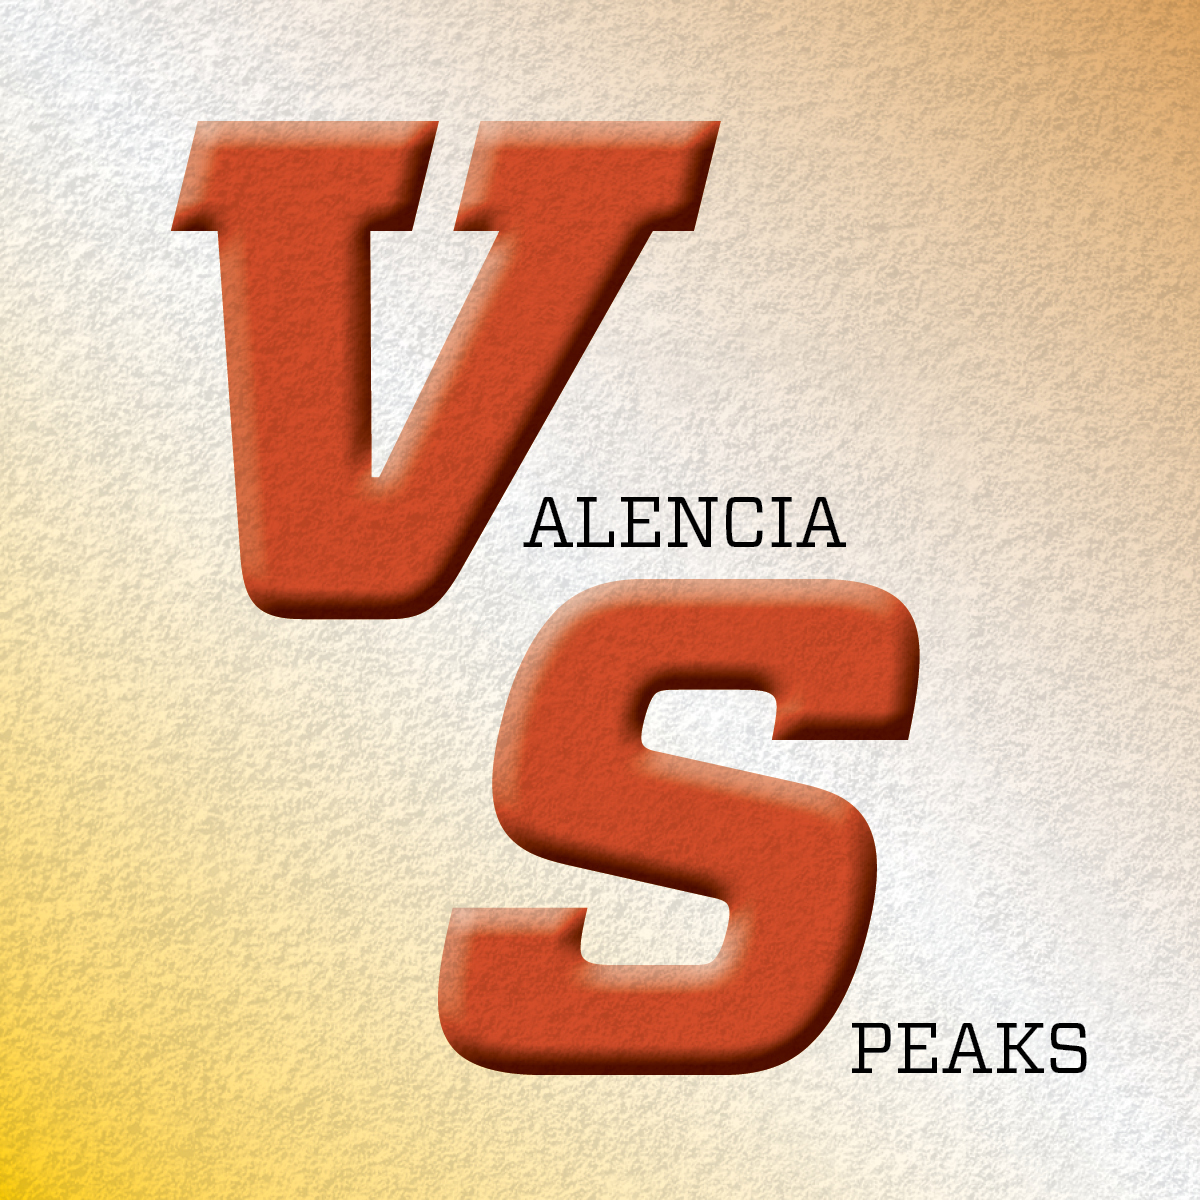 Valencia Calendar.Unm Events Calendar Valencia Speaks